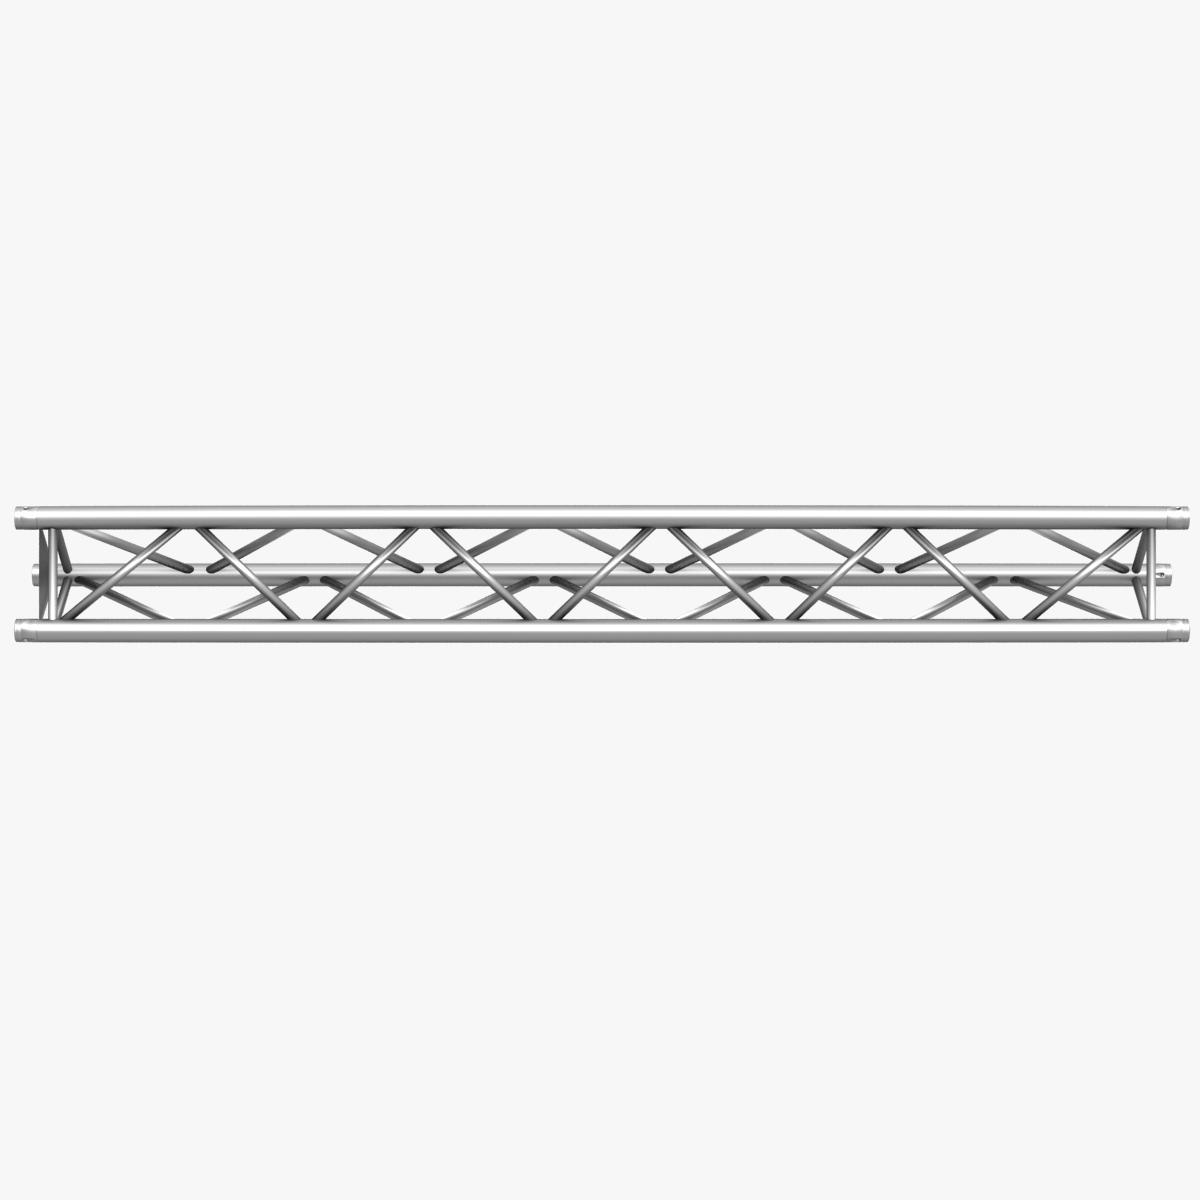 triangular trusses (collection 55 modular pieces) 3d model 3ds max dxf fbx c4d dae texture obj 216216